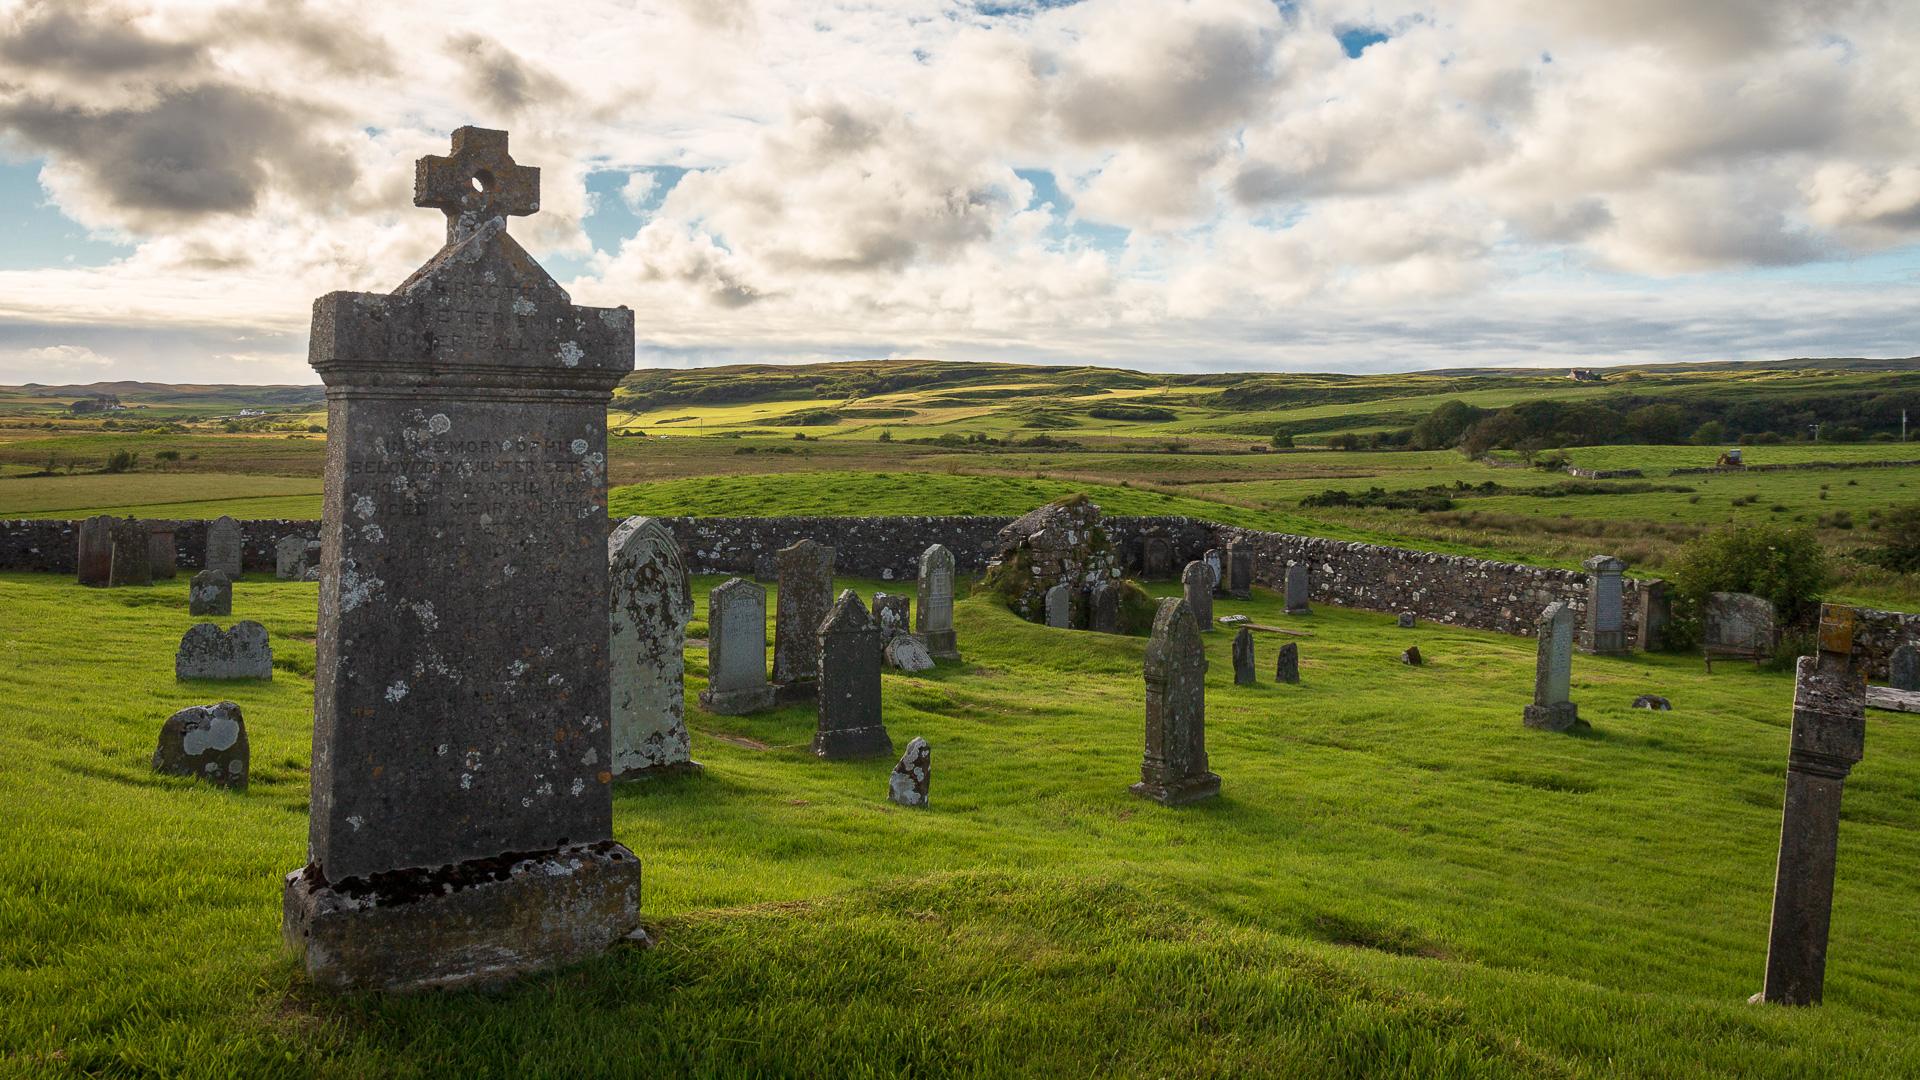 Kilmeny Graveyard